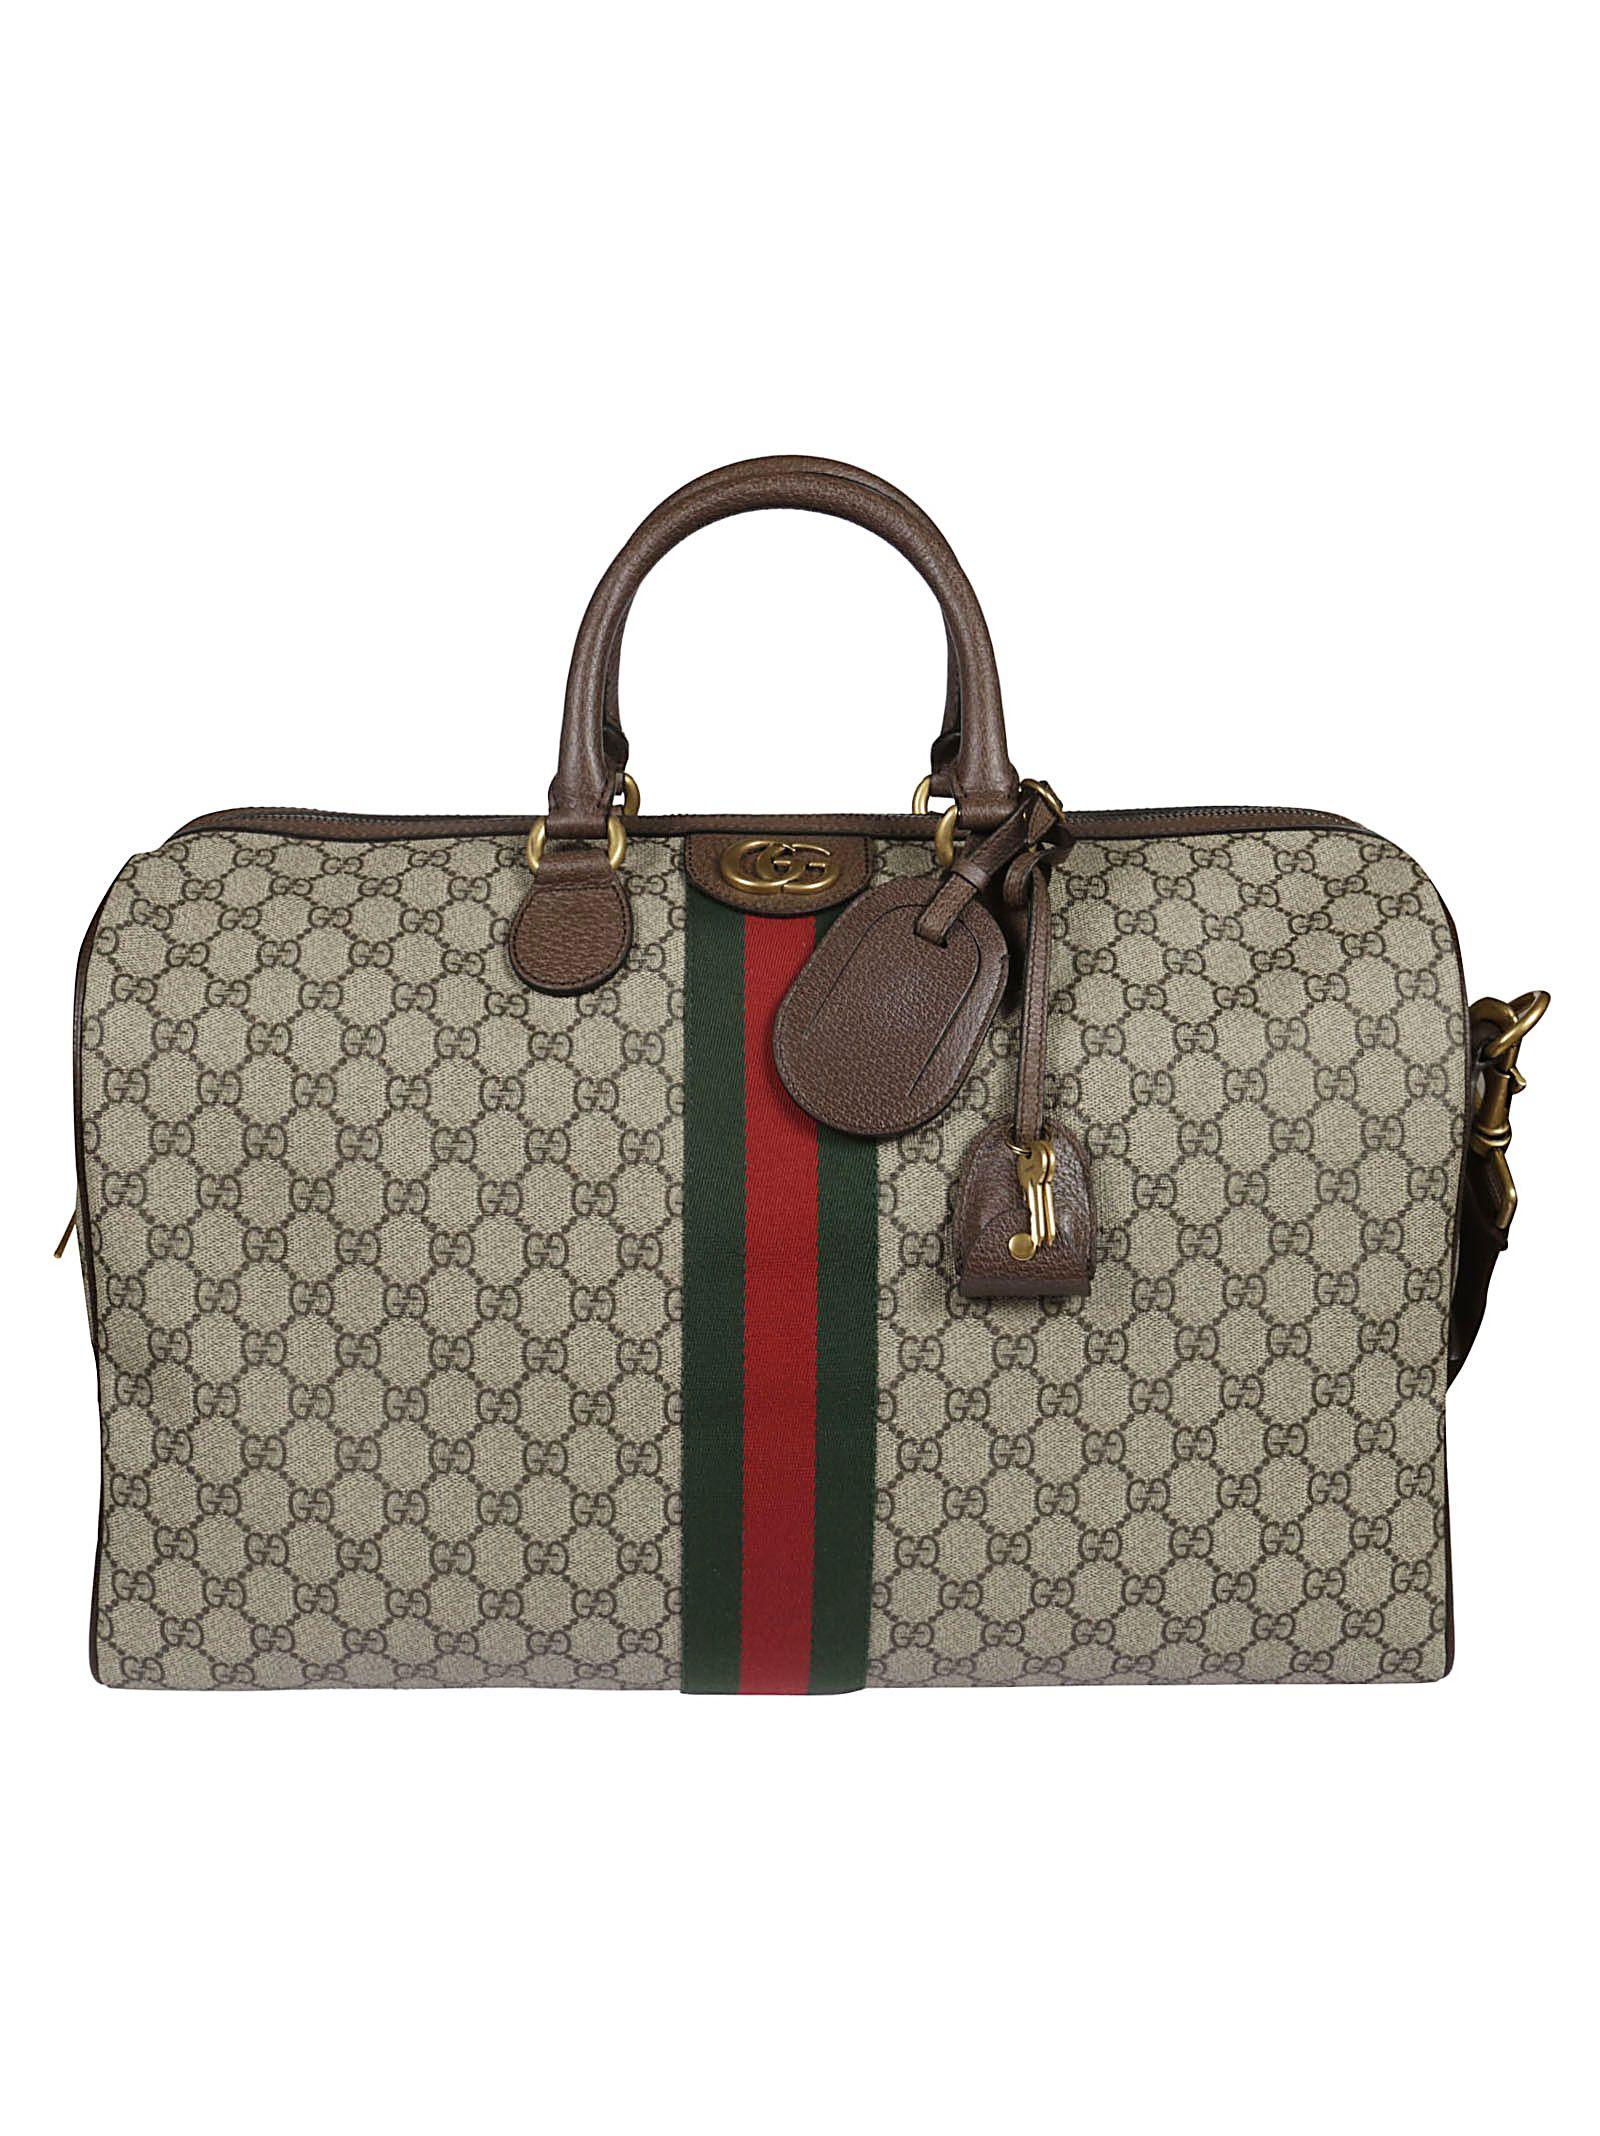 acdcc1f578d1 Gucci Gucci Ophidia Gg Medium Duffle Bag - ebony - 10930836 | italist